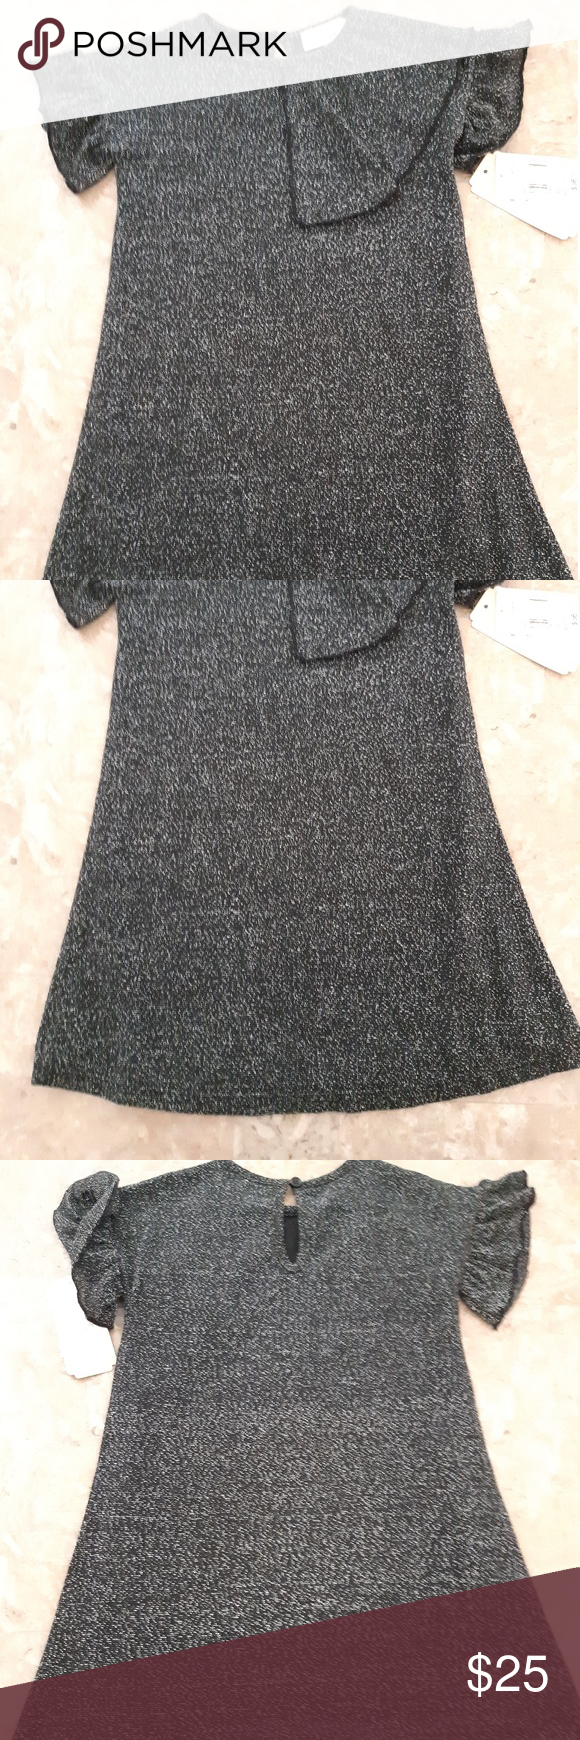 Gb Girls Dress Black Silver Shimmery Size 2t Kids Girls Dresses Shimmery Dress Dresses [ 1740 x 580 Pixel ]